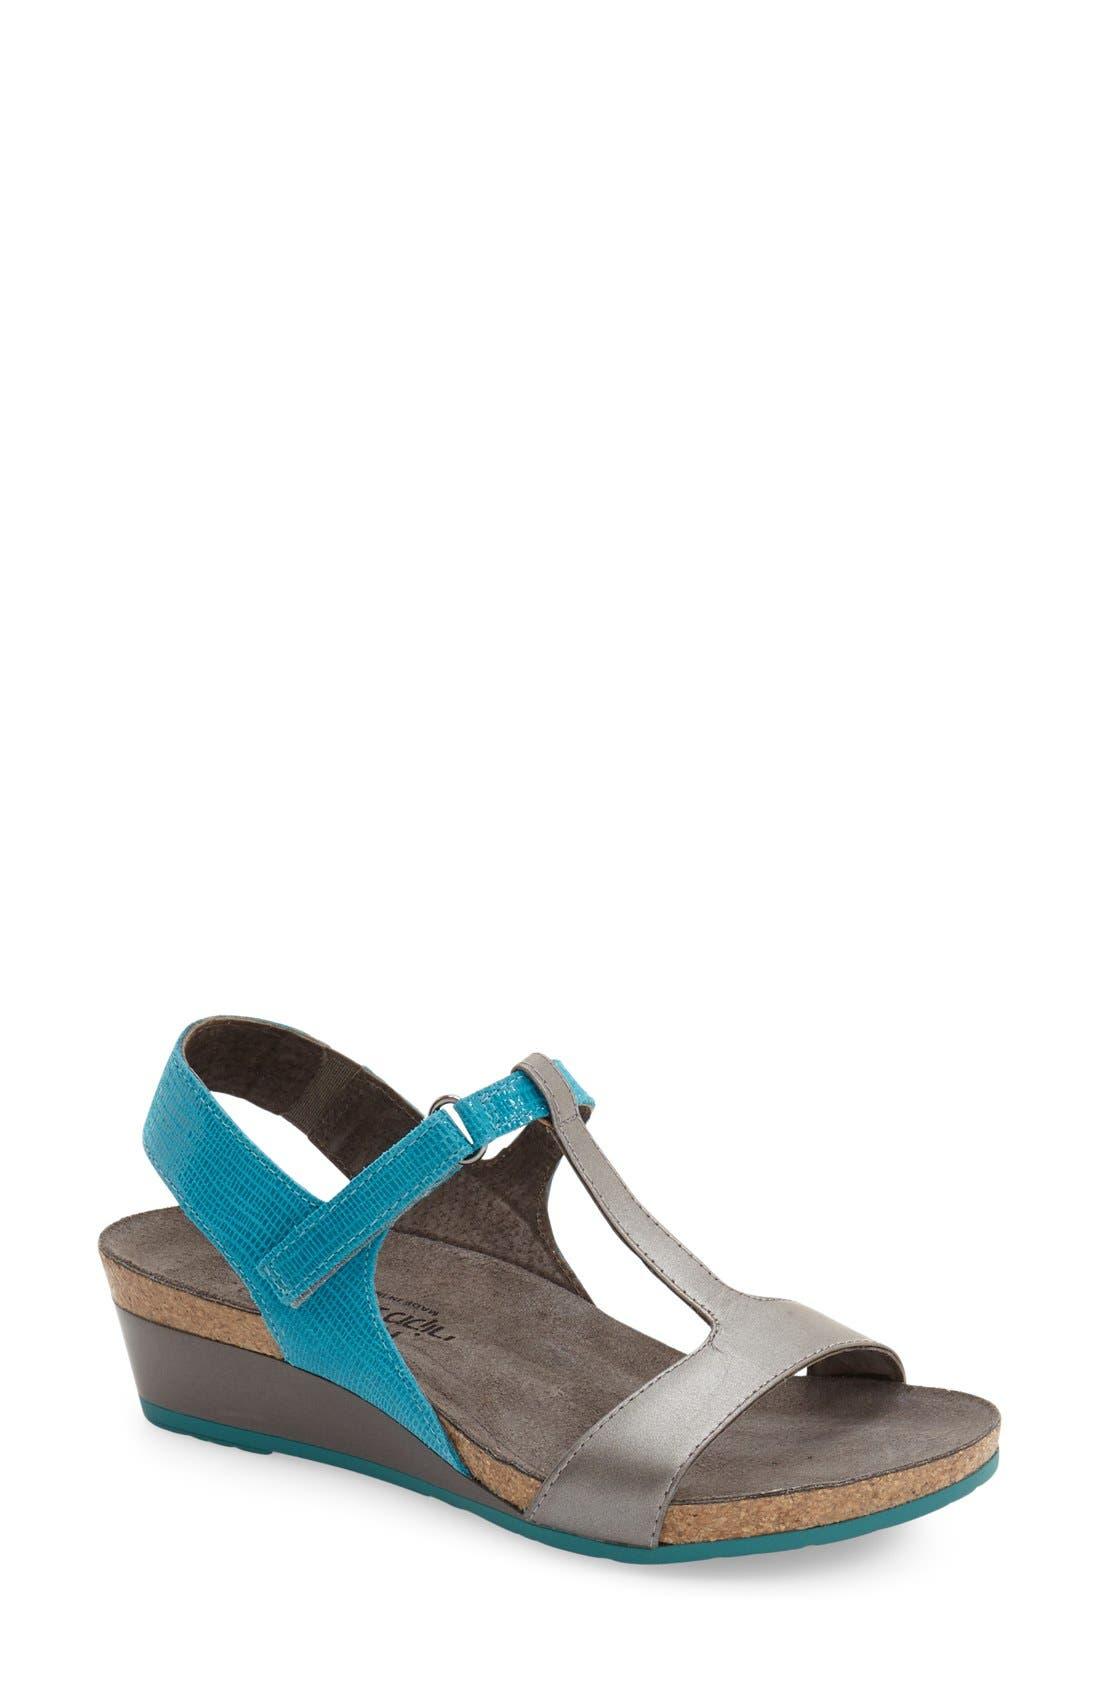 'Unicorn' T-Strap Sandal,                         Main,                         color, AQUAMARINE LEATHER